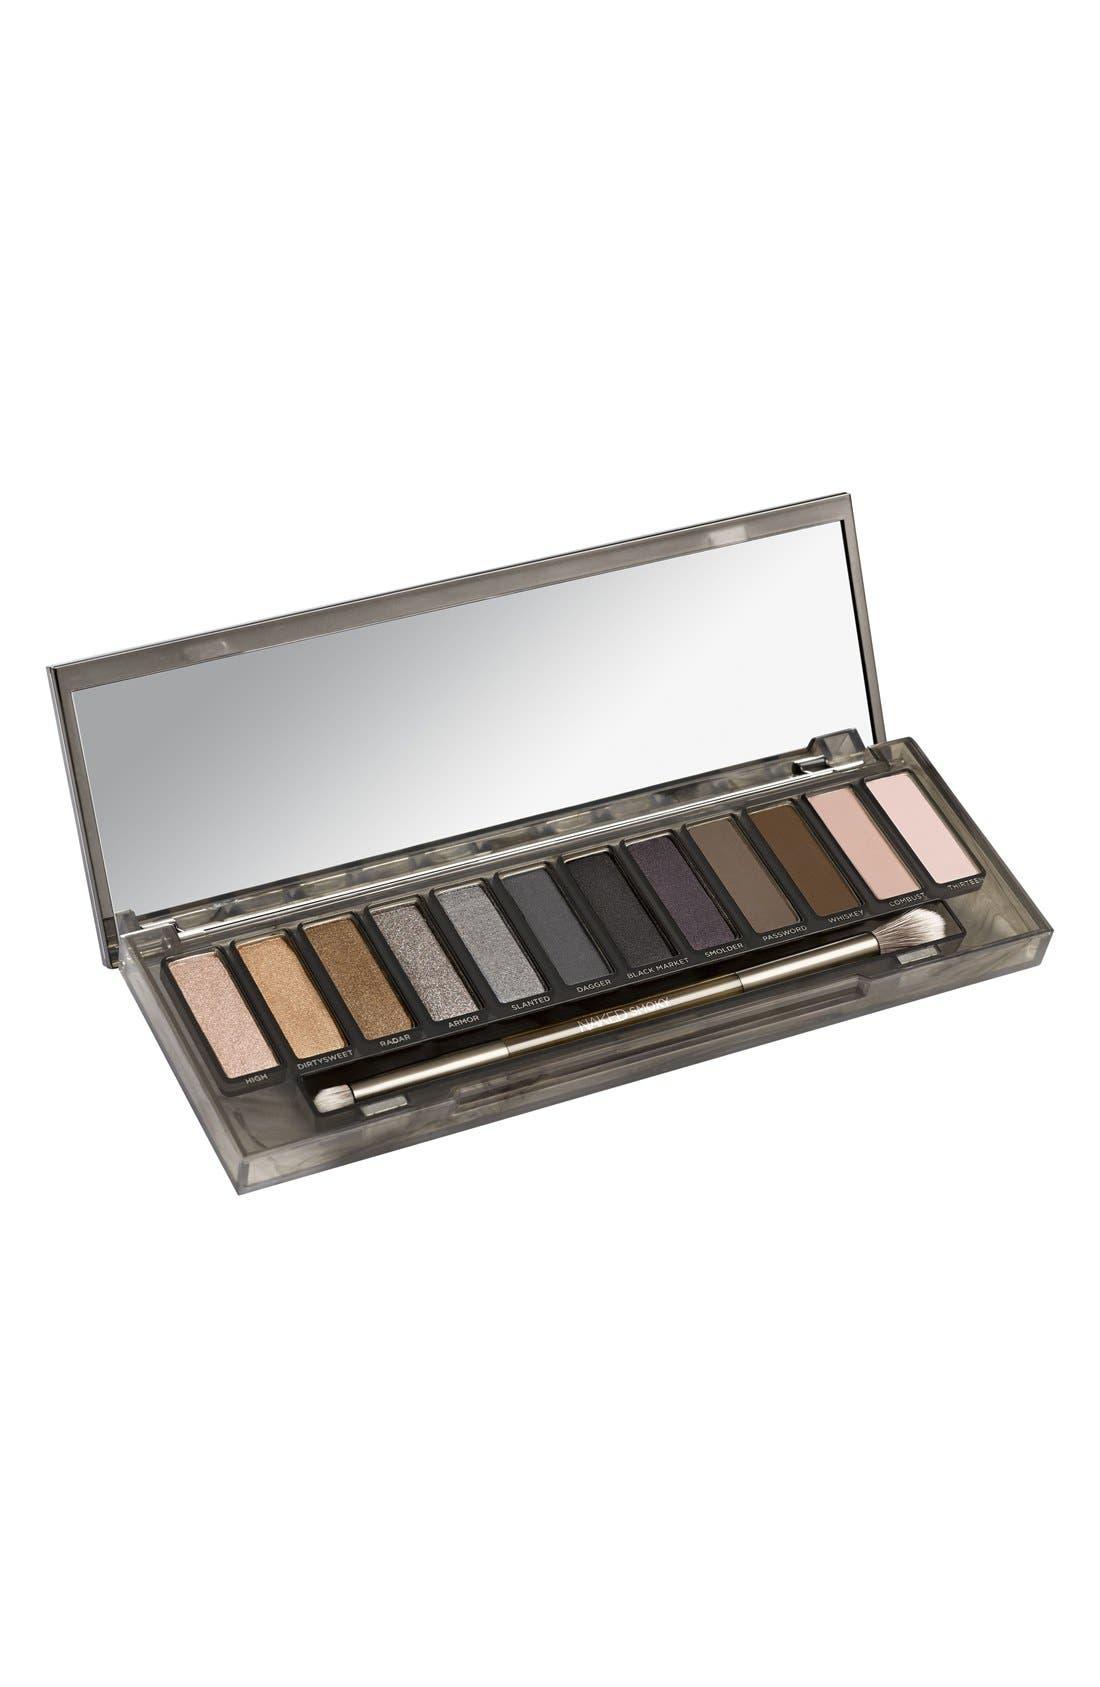 'Naked Smoky' Palette,                         Main,                         color, 000